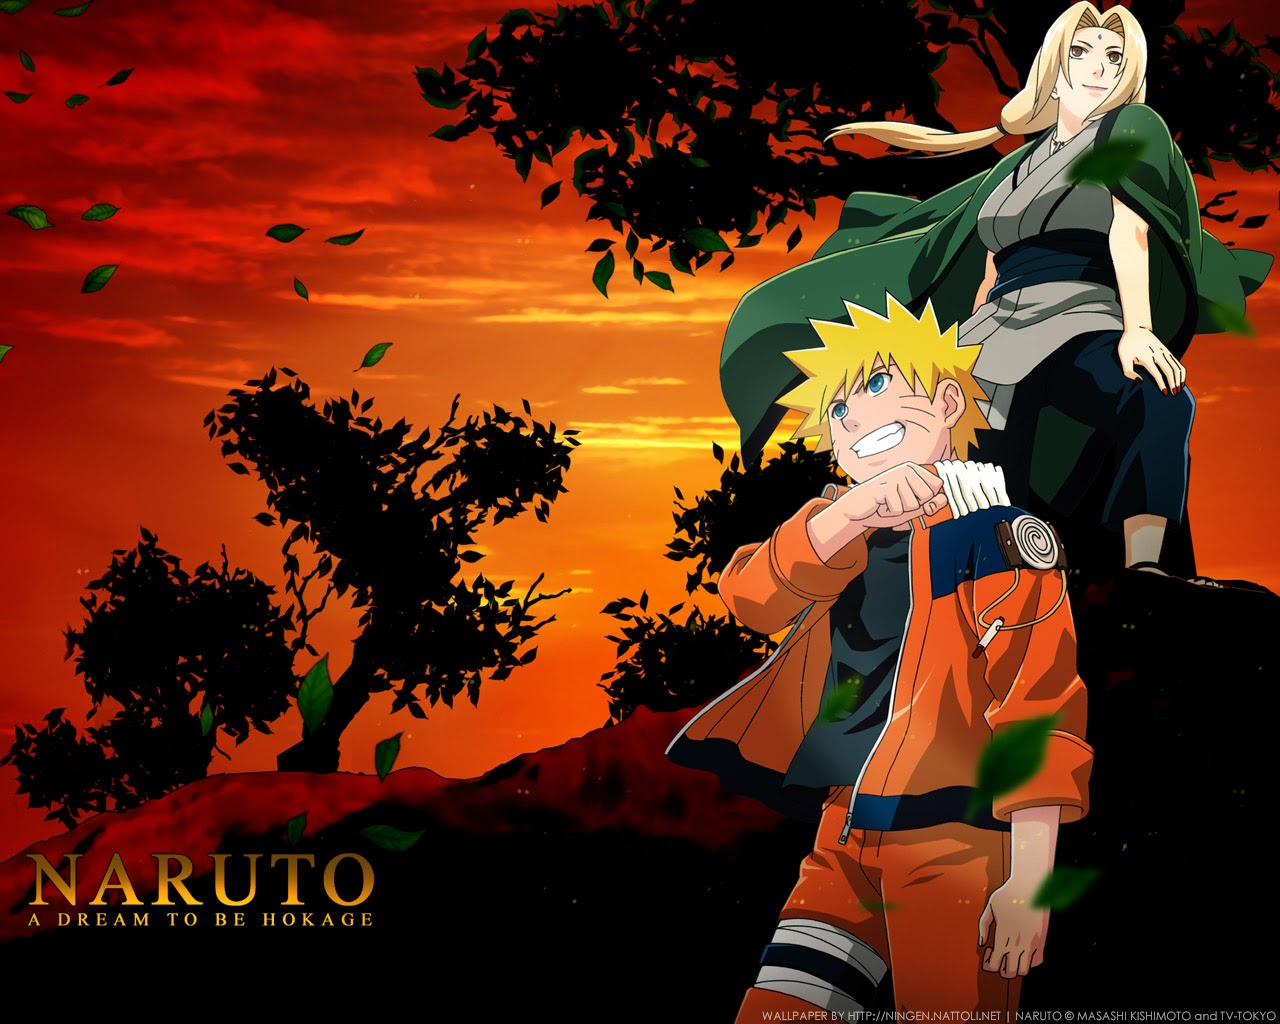 http://2.bp.blogspot.com/-NCyMjjtvCsY/UL8ouj94ZmI/AAAAAAAADPE/kkk3eO8dFA8/s1600/Naruto-wallpaper-32.jpg